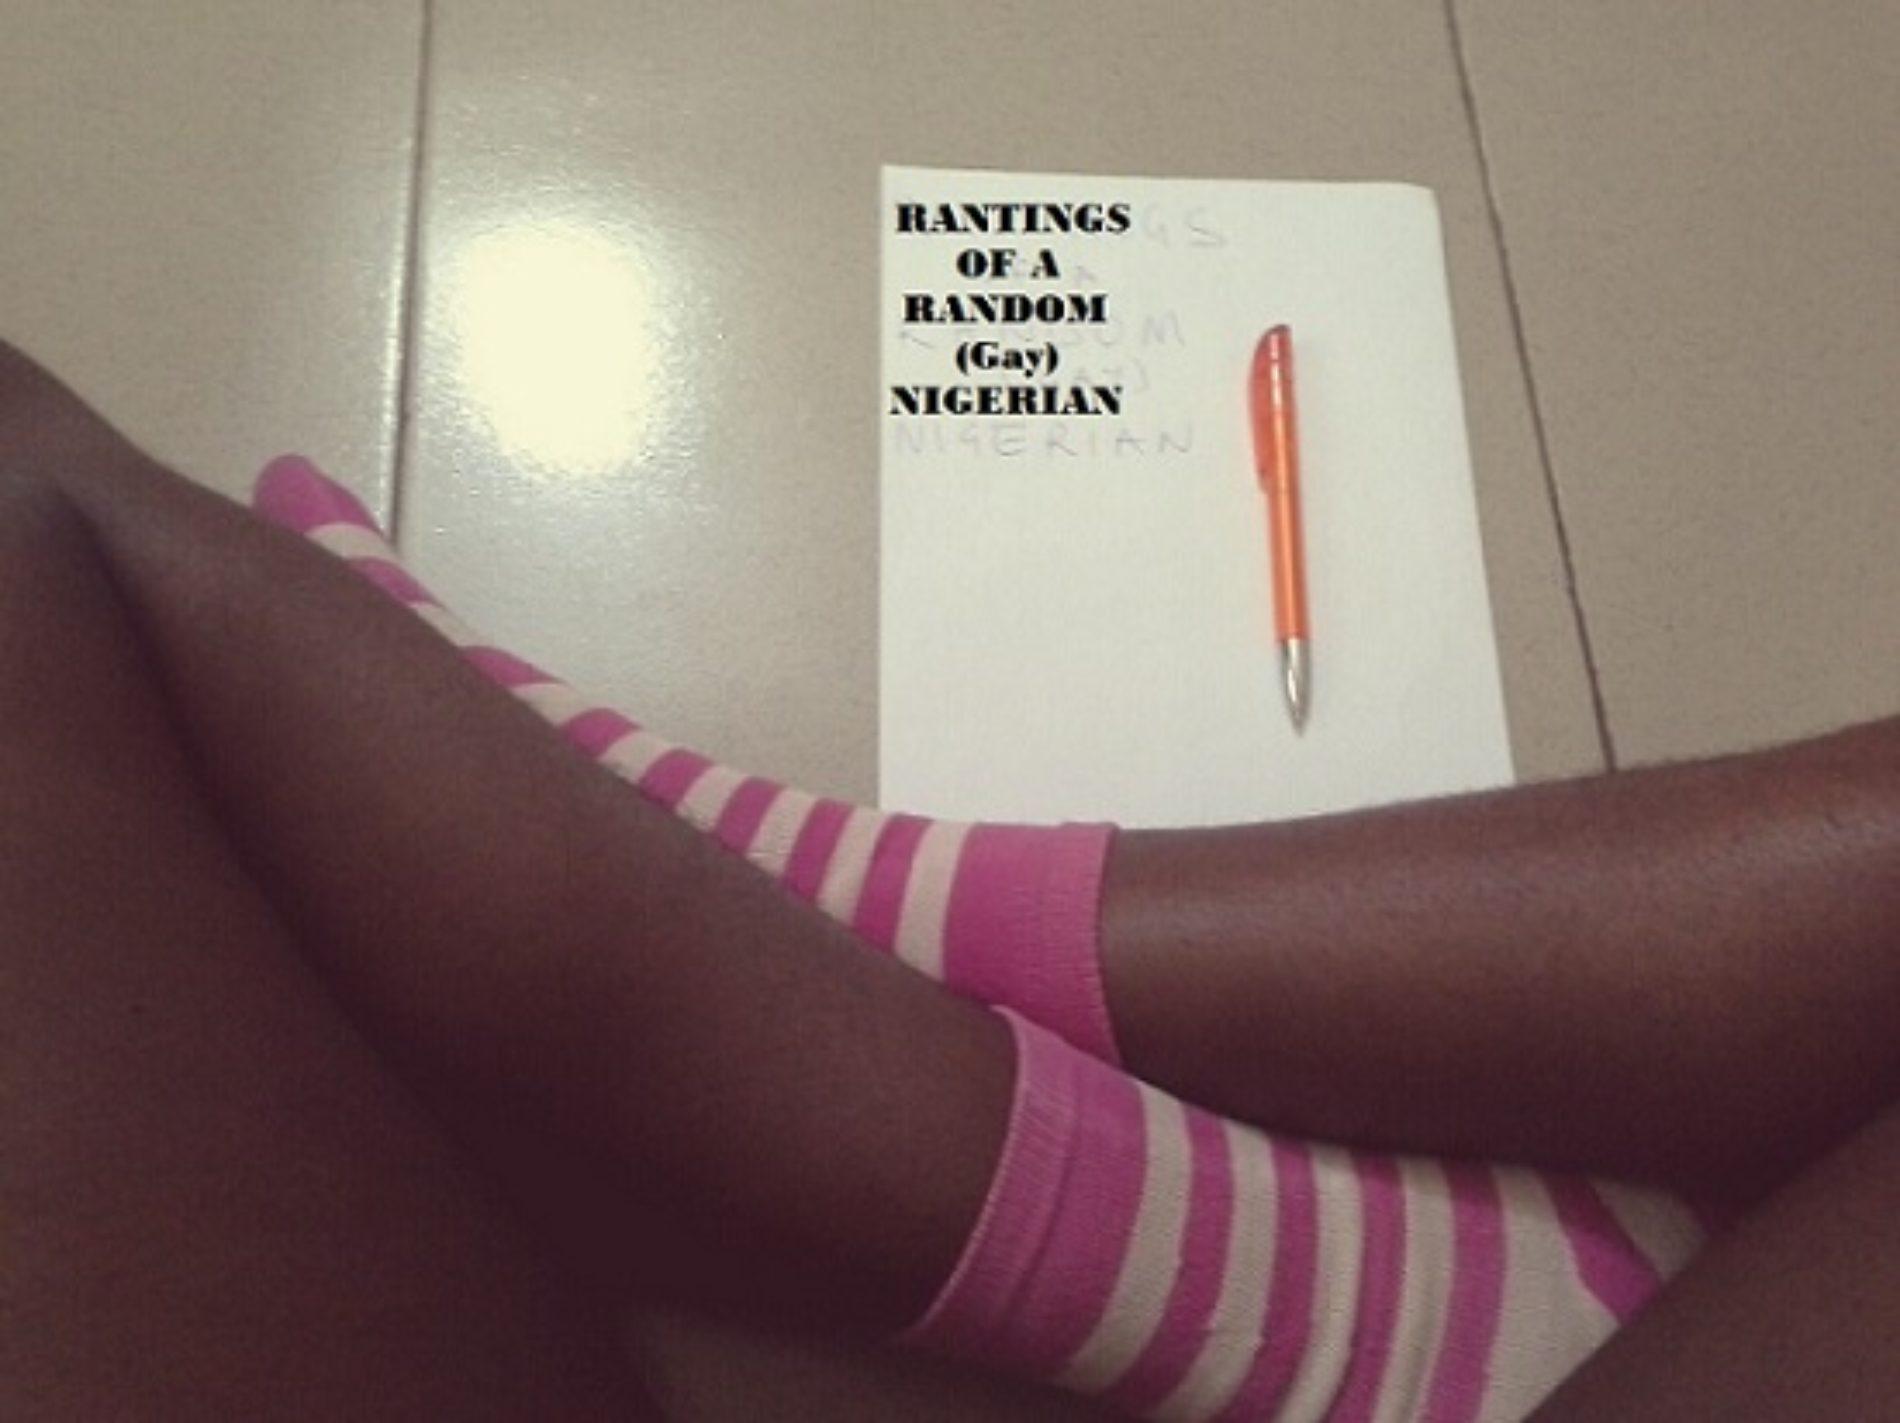 RANTINGS OF A RANDOM (Gay) NIGERIAN (Entry 12)